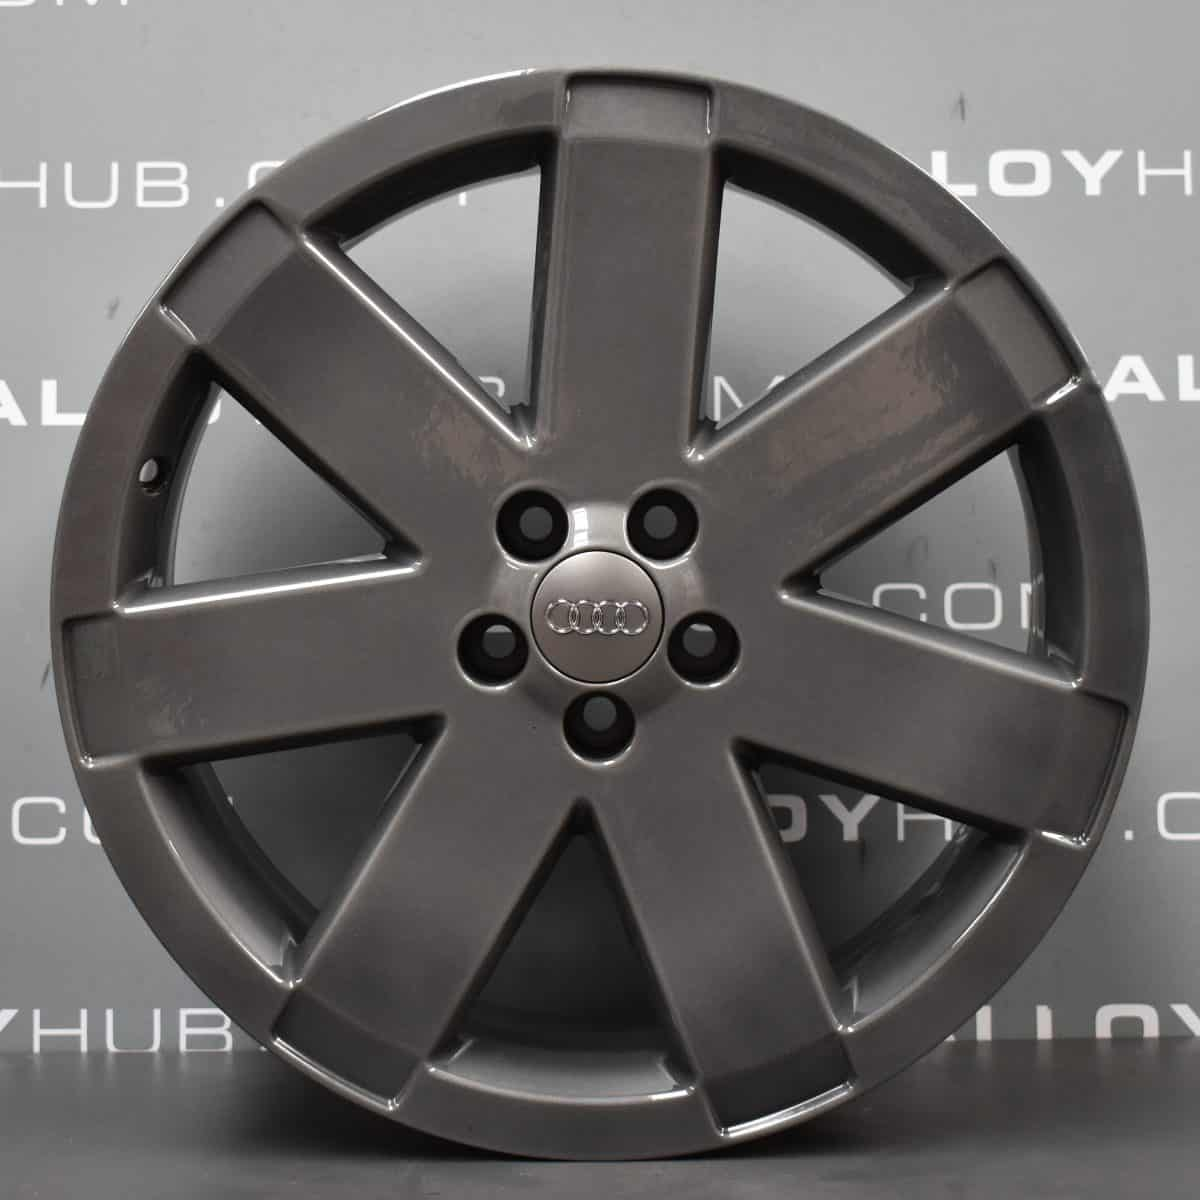 "Genuine Audi TT 8N MK1 3.2 V6 Ronal 7 Spoke 18"" Inch Alloy Wheels with Anthracite Grey Finish 8N0 601 025 T"